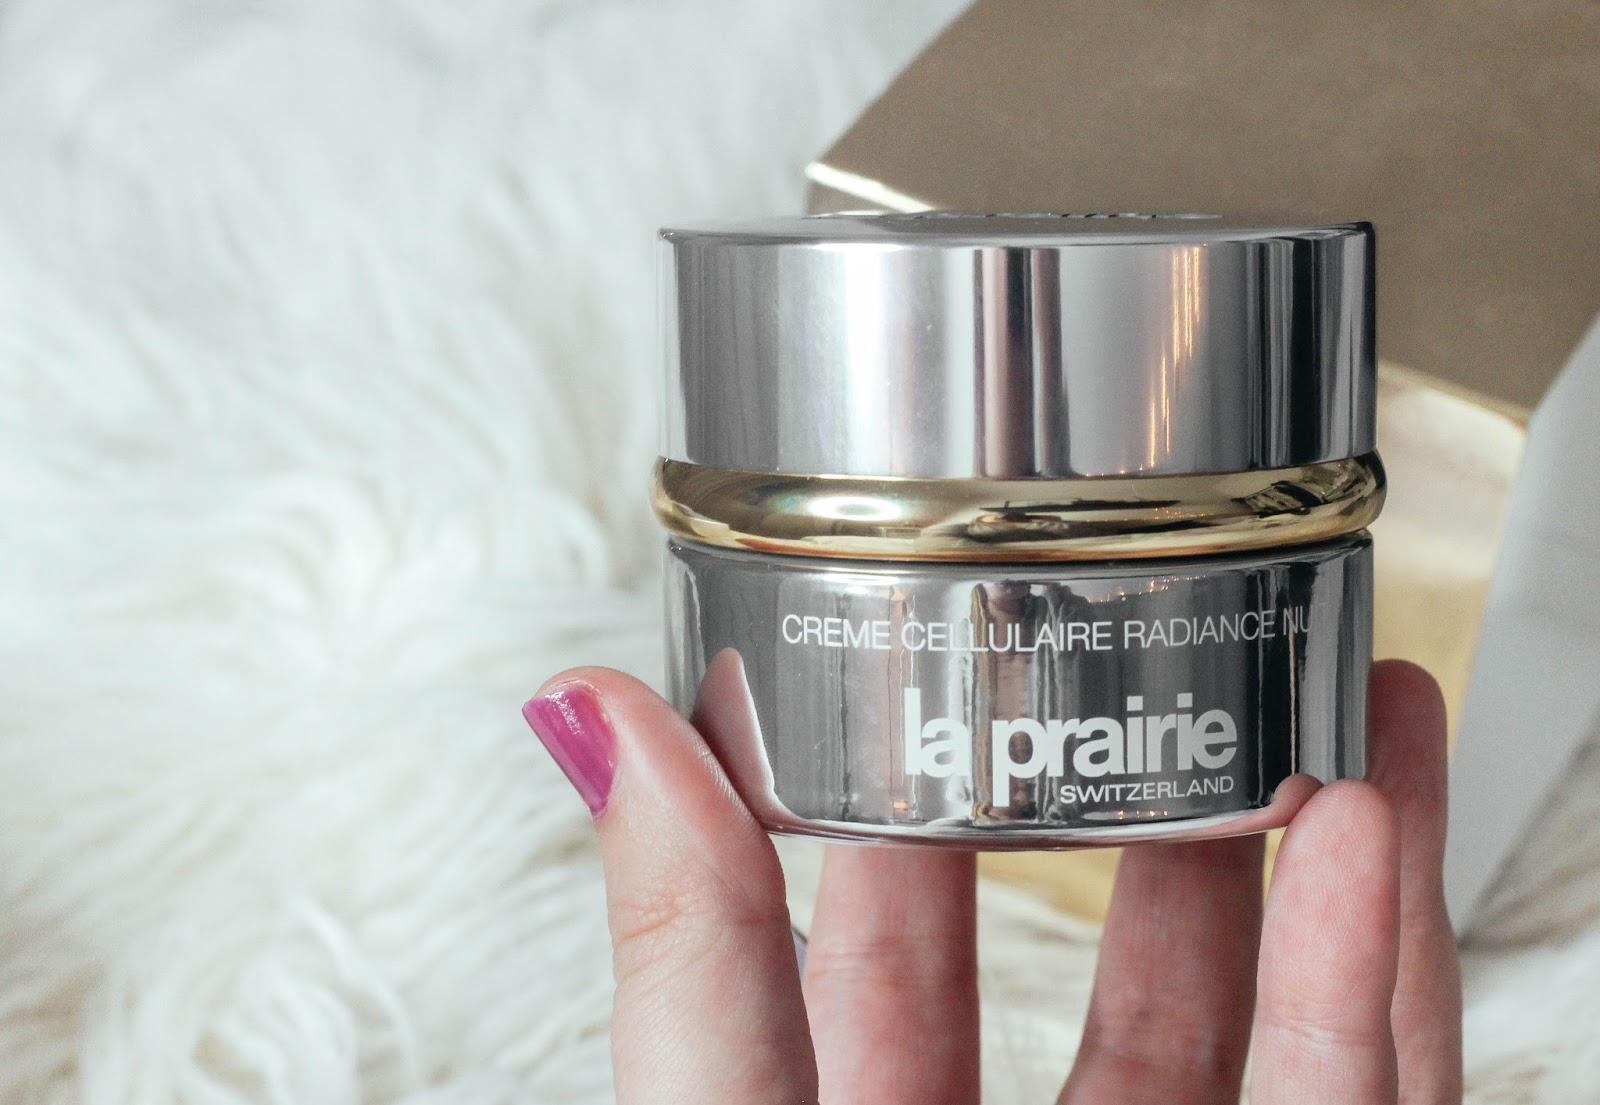 La Prairie cellular radiance night cream review